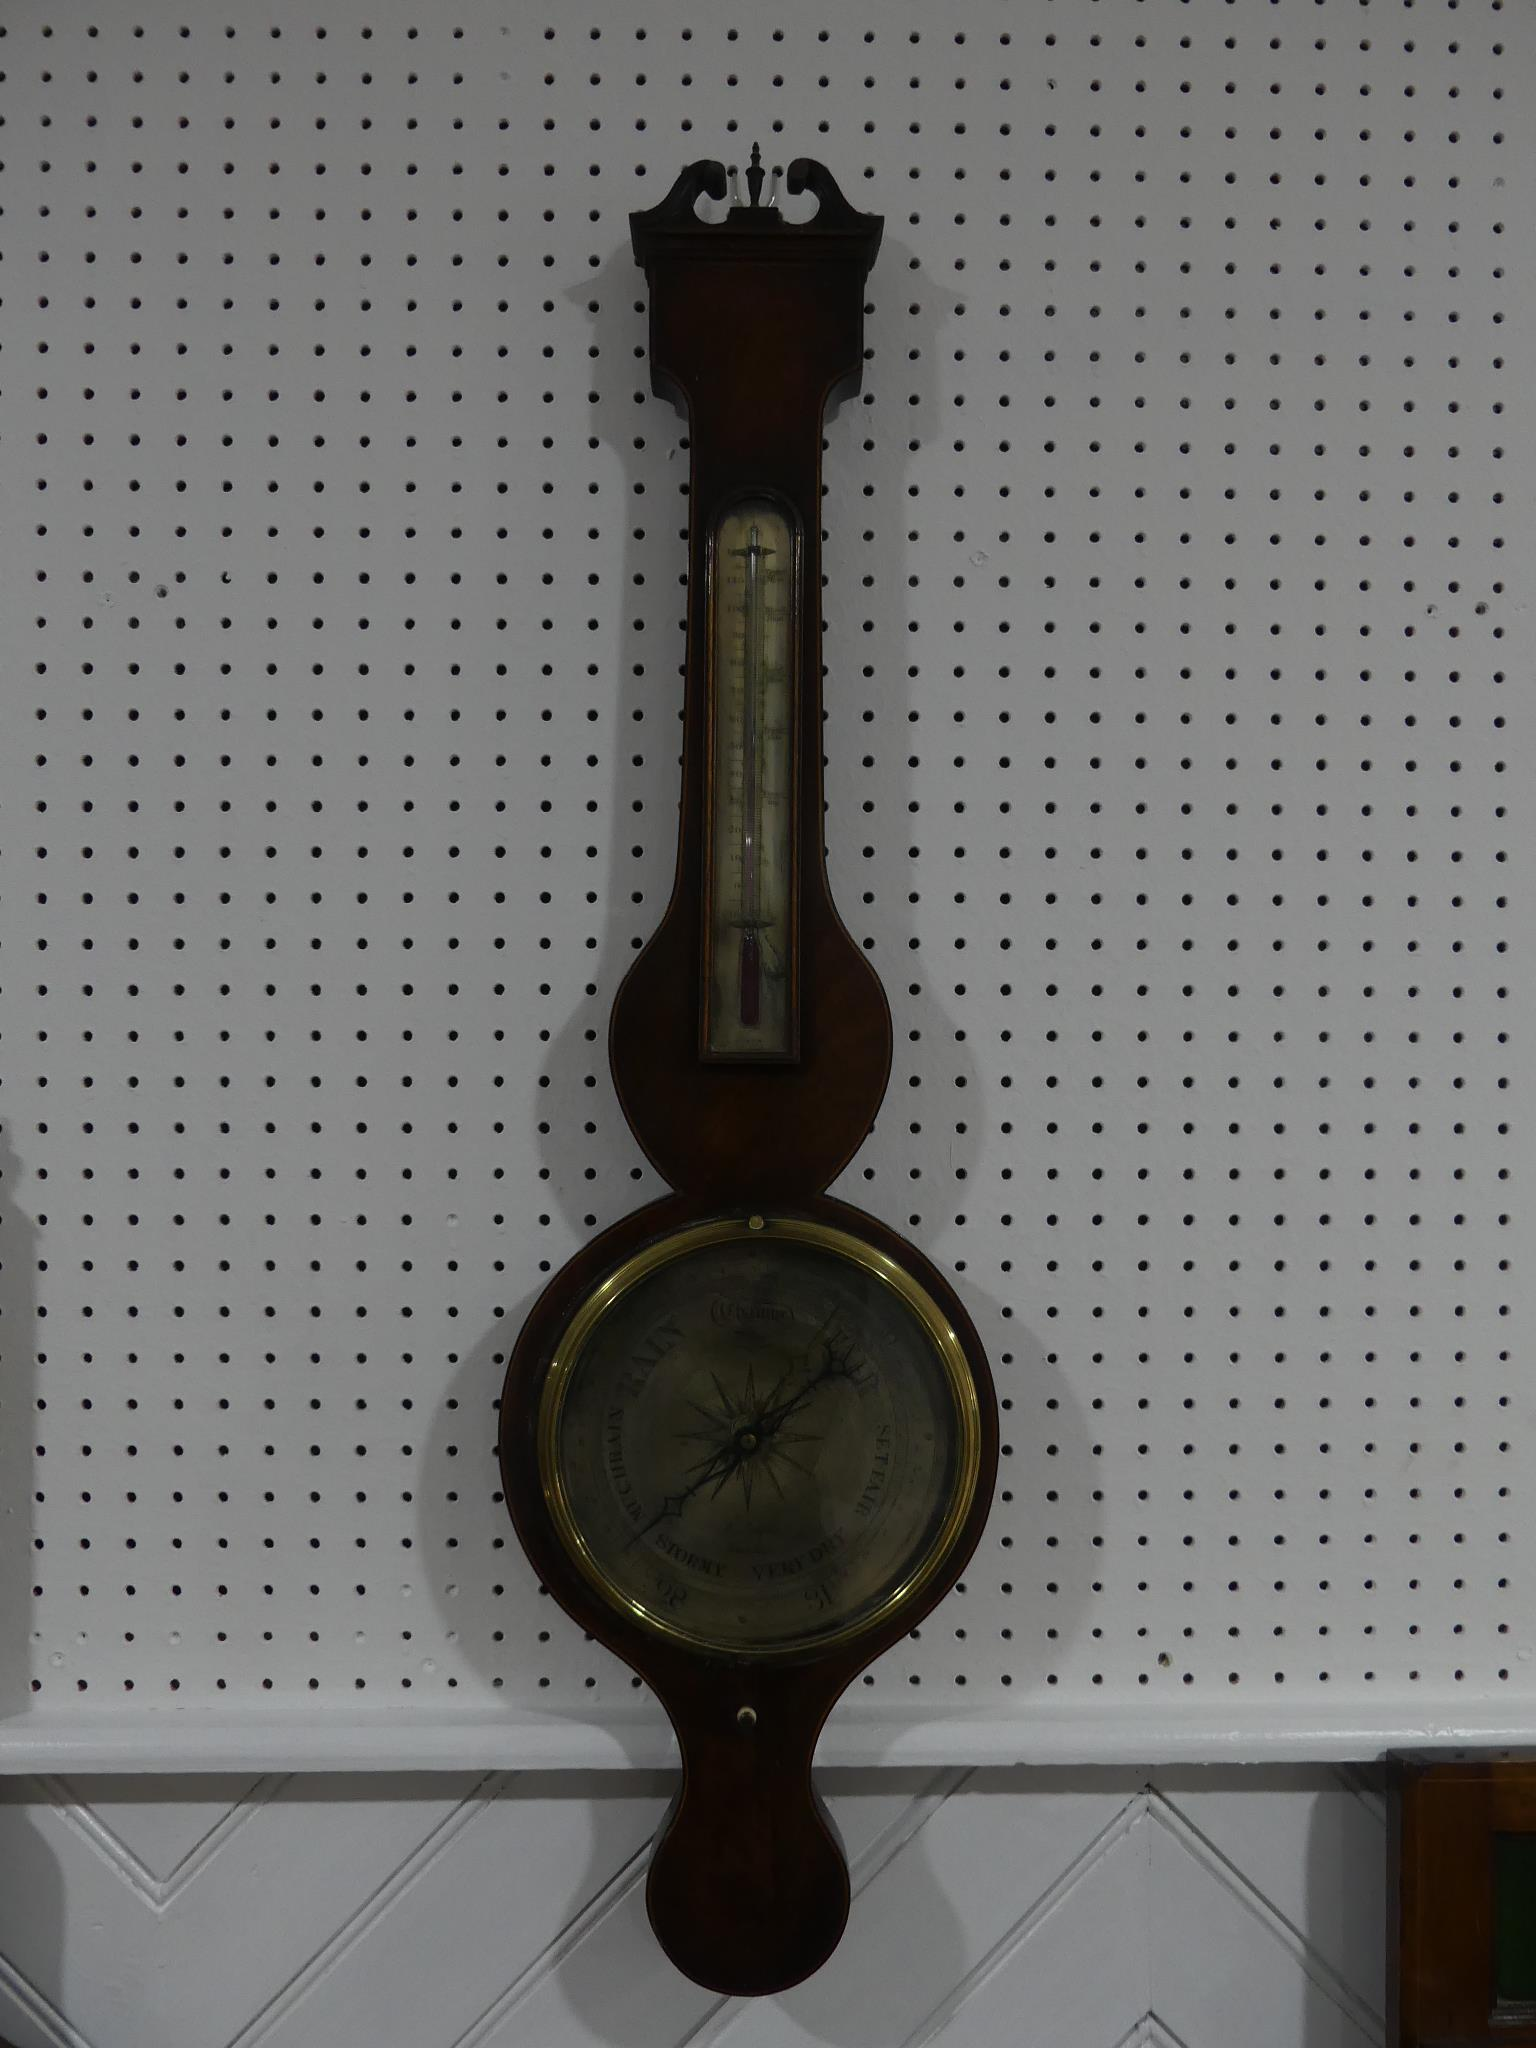 An early 19thC mahogany wheel Barometer, signed P Nolfi, Taunton with a circular silvered dial,